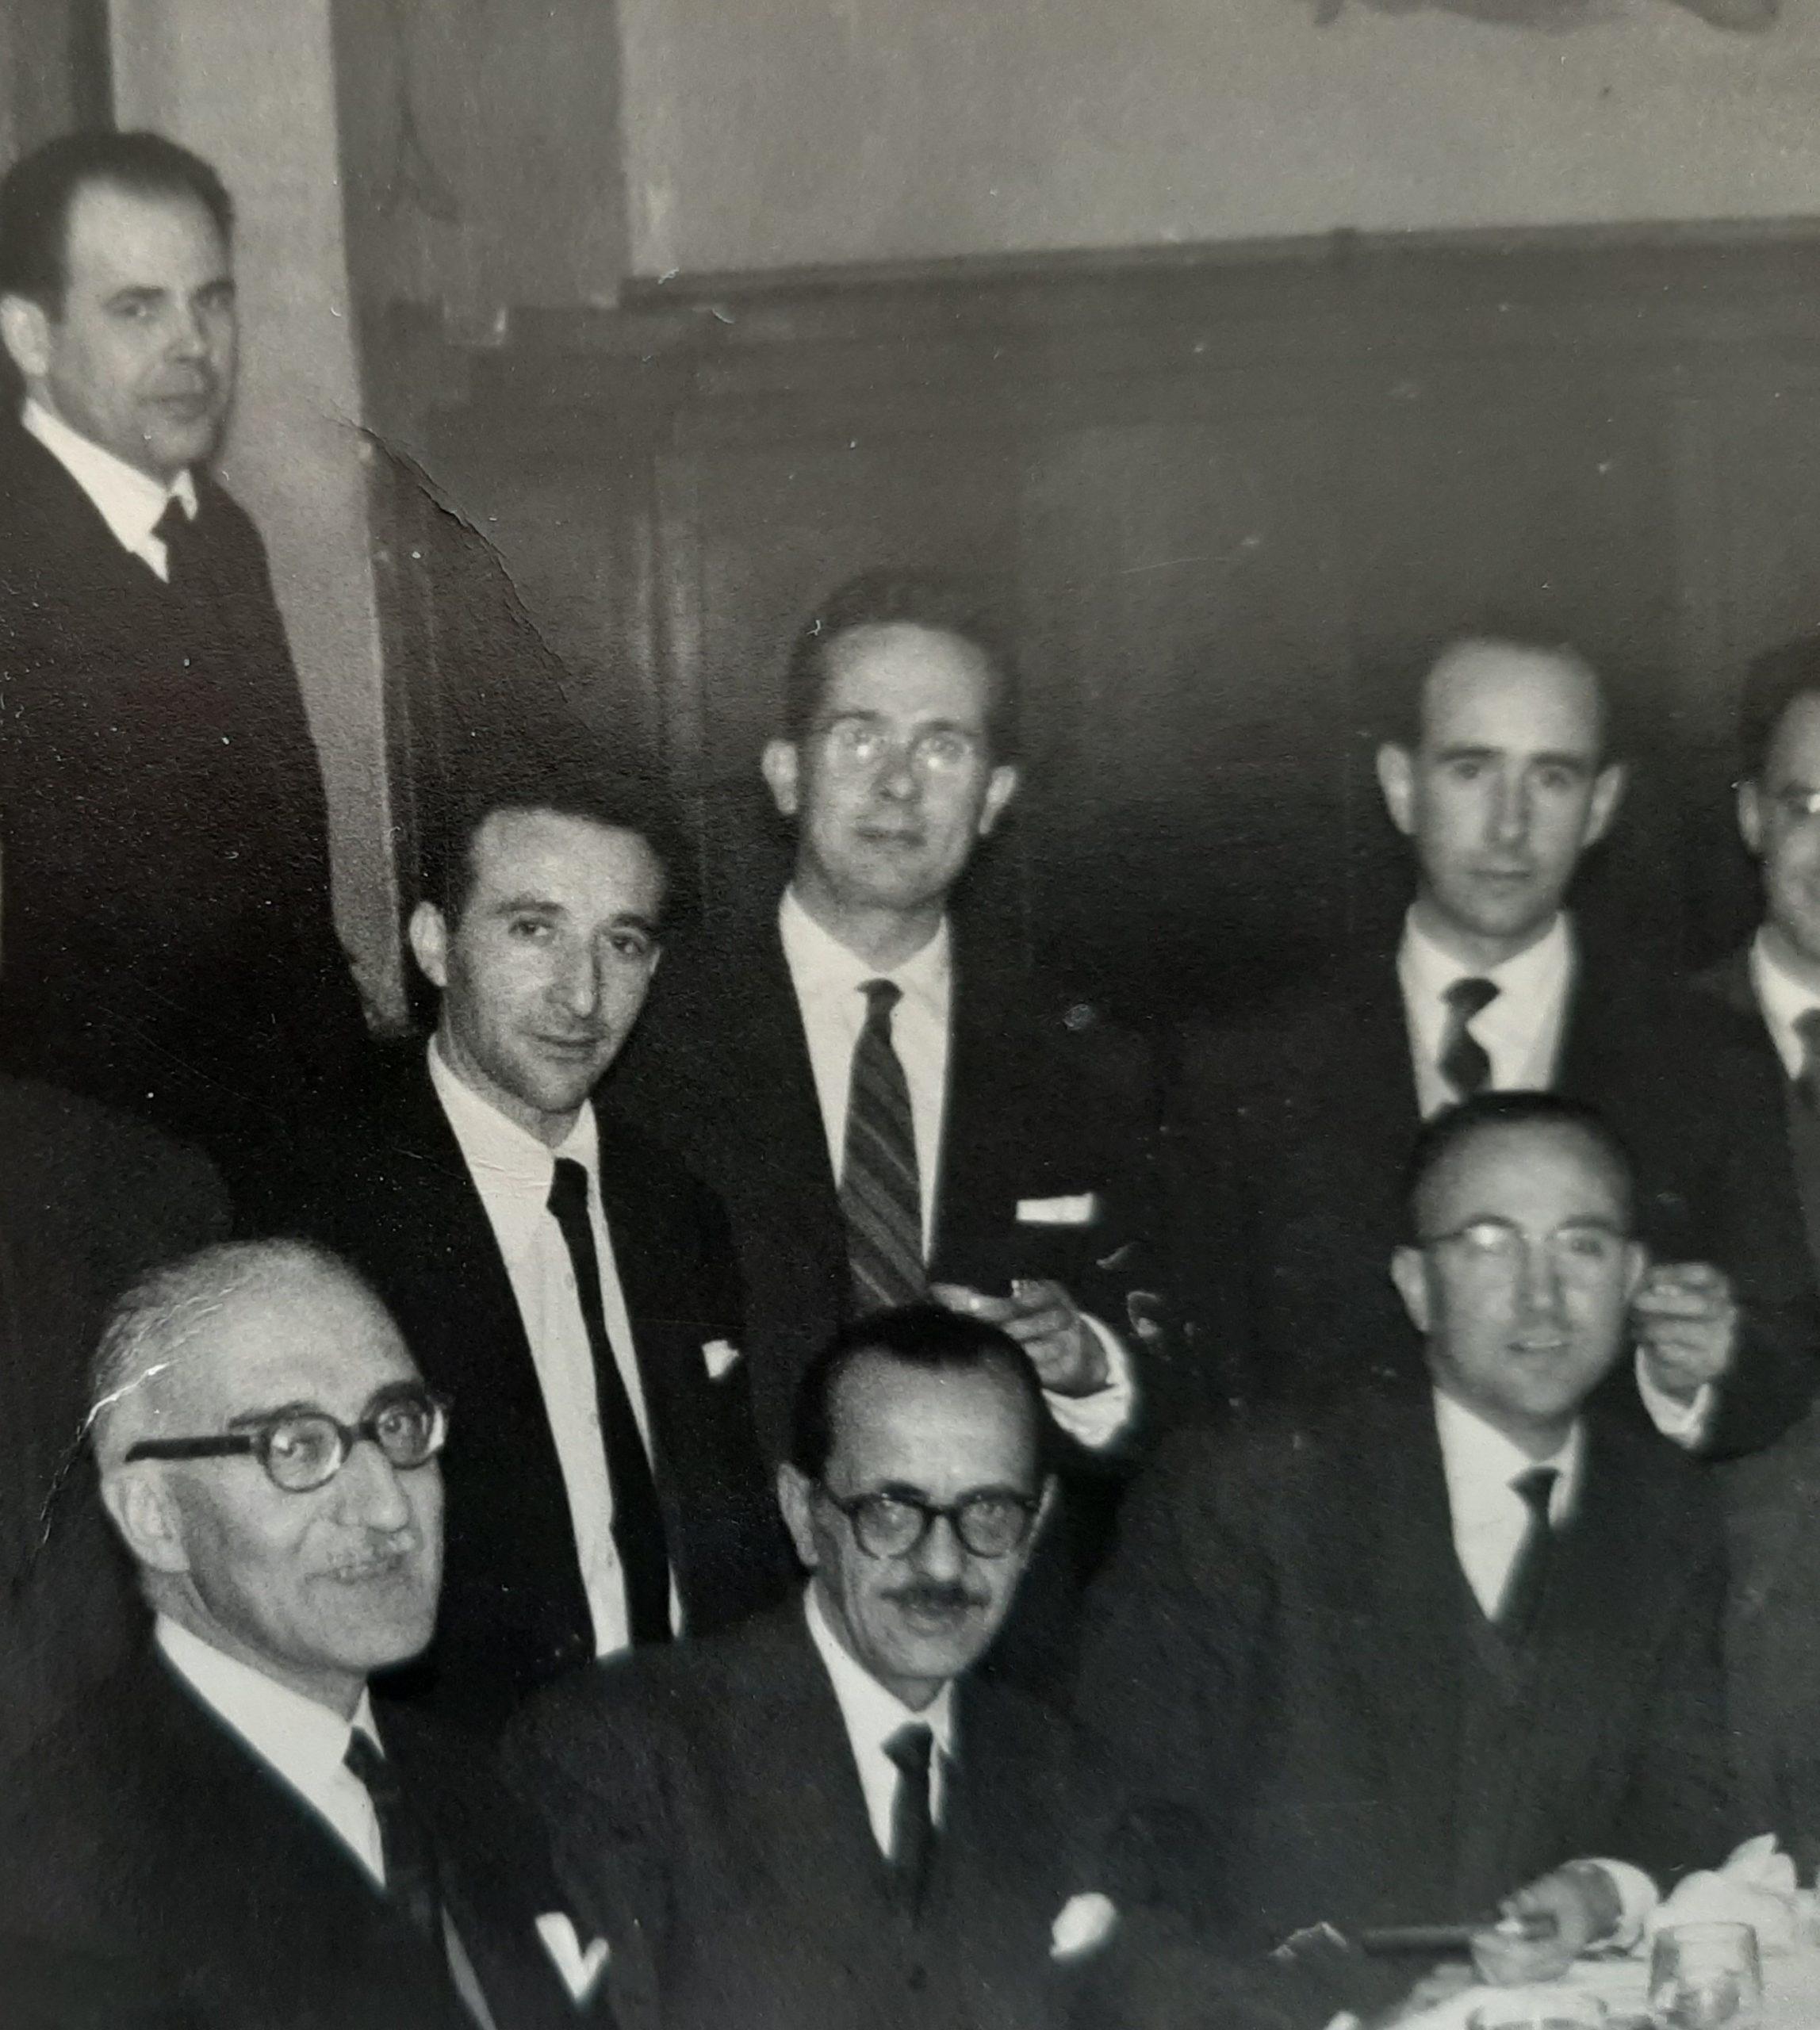 Instituto Ramiro de Maeztu